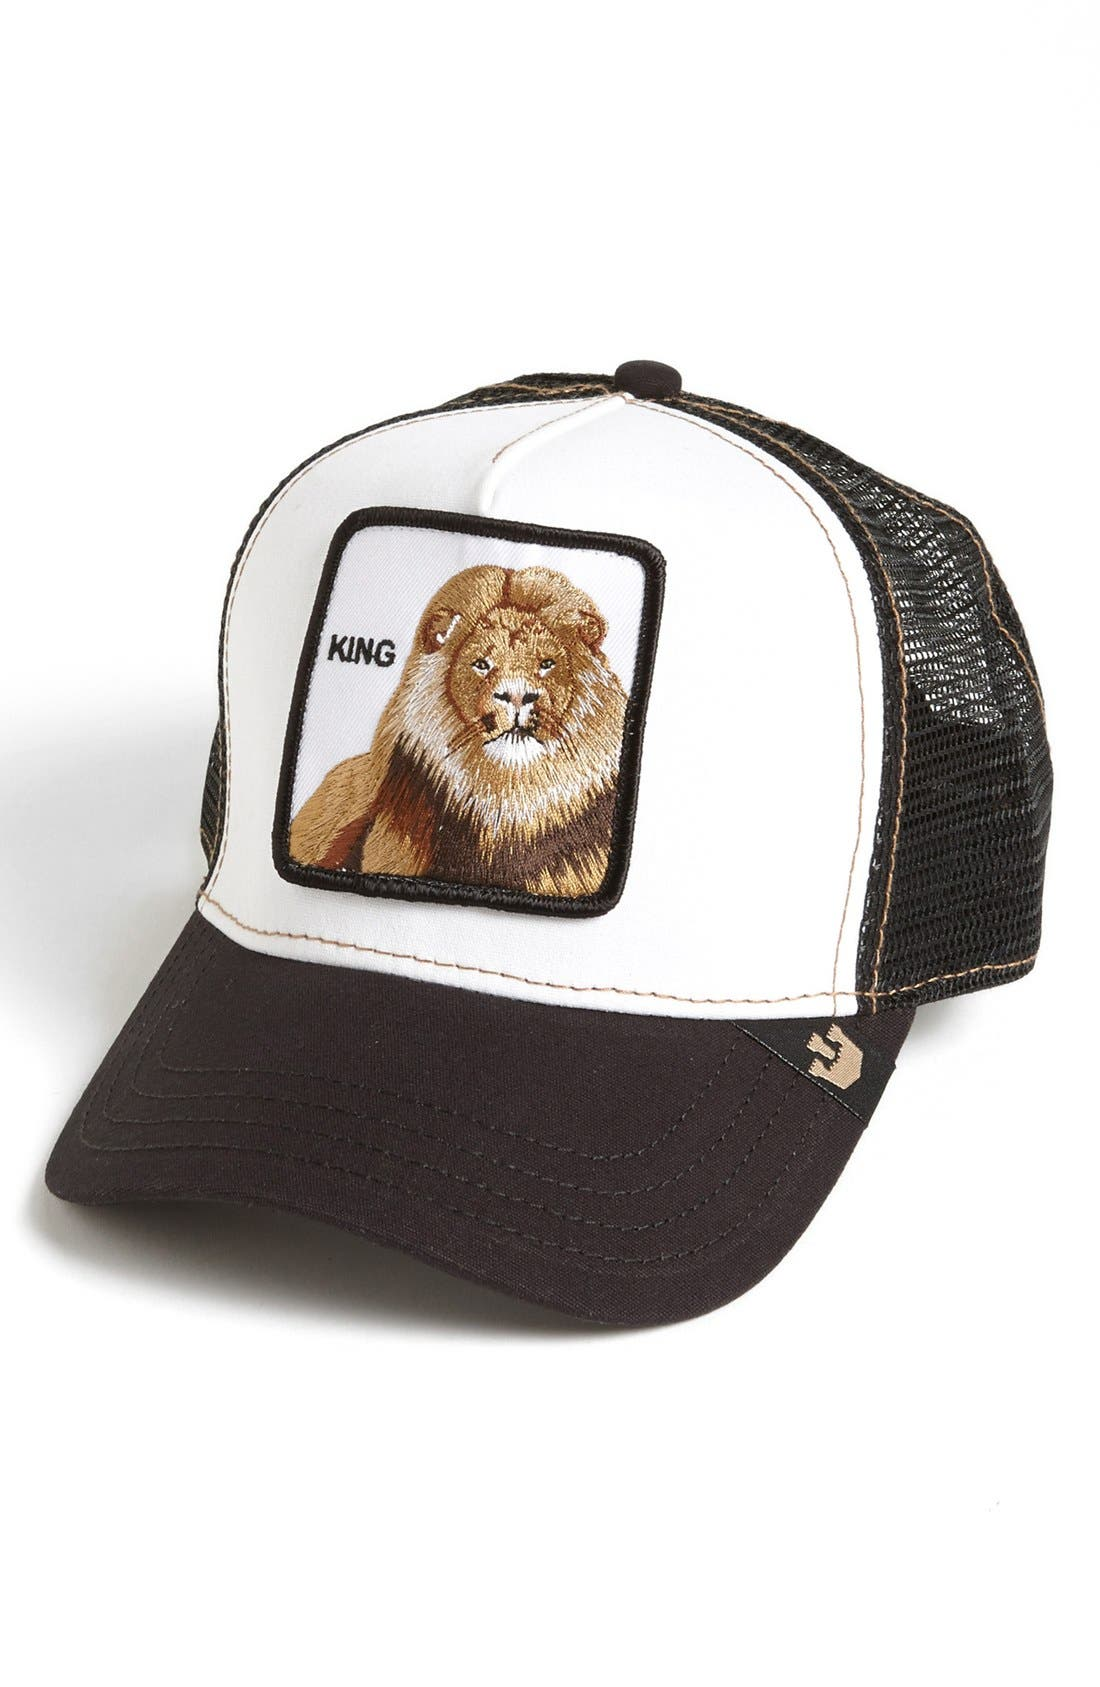 'Animal Farm - King' Trucker Hat,                         Main,                         color, Black